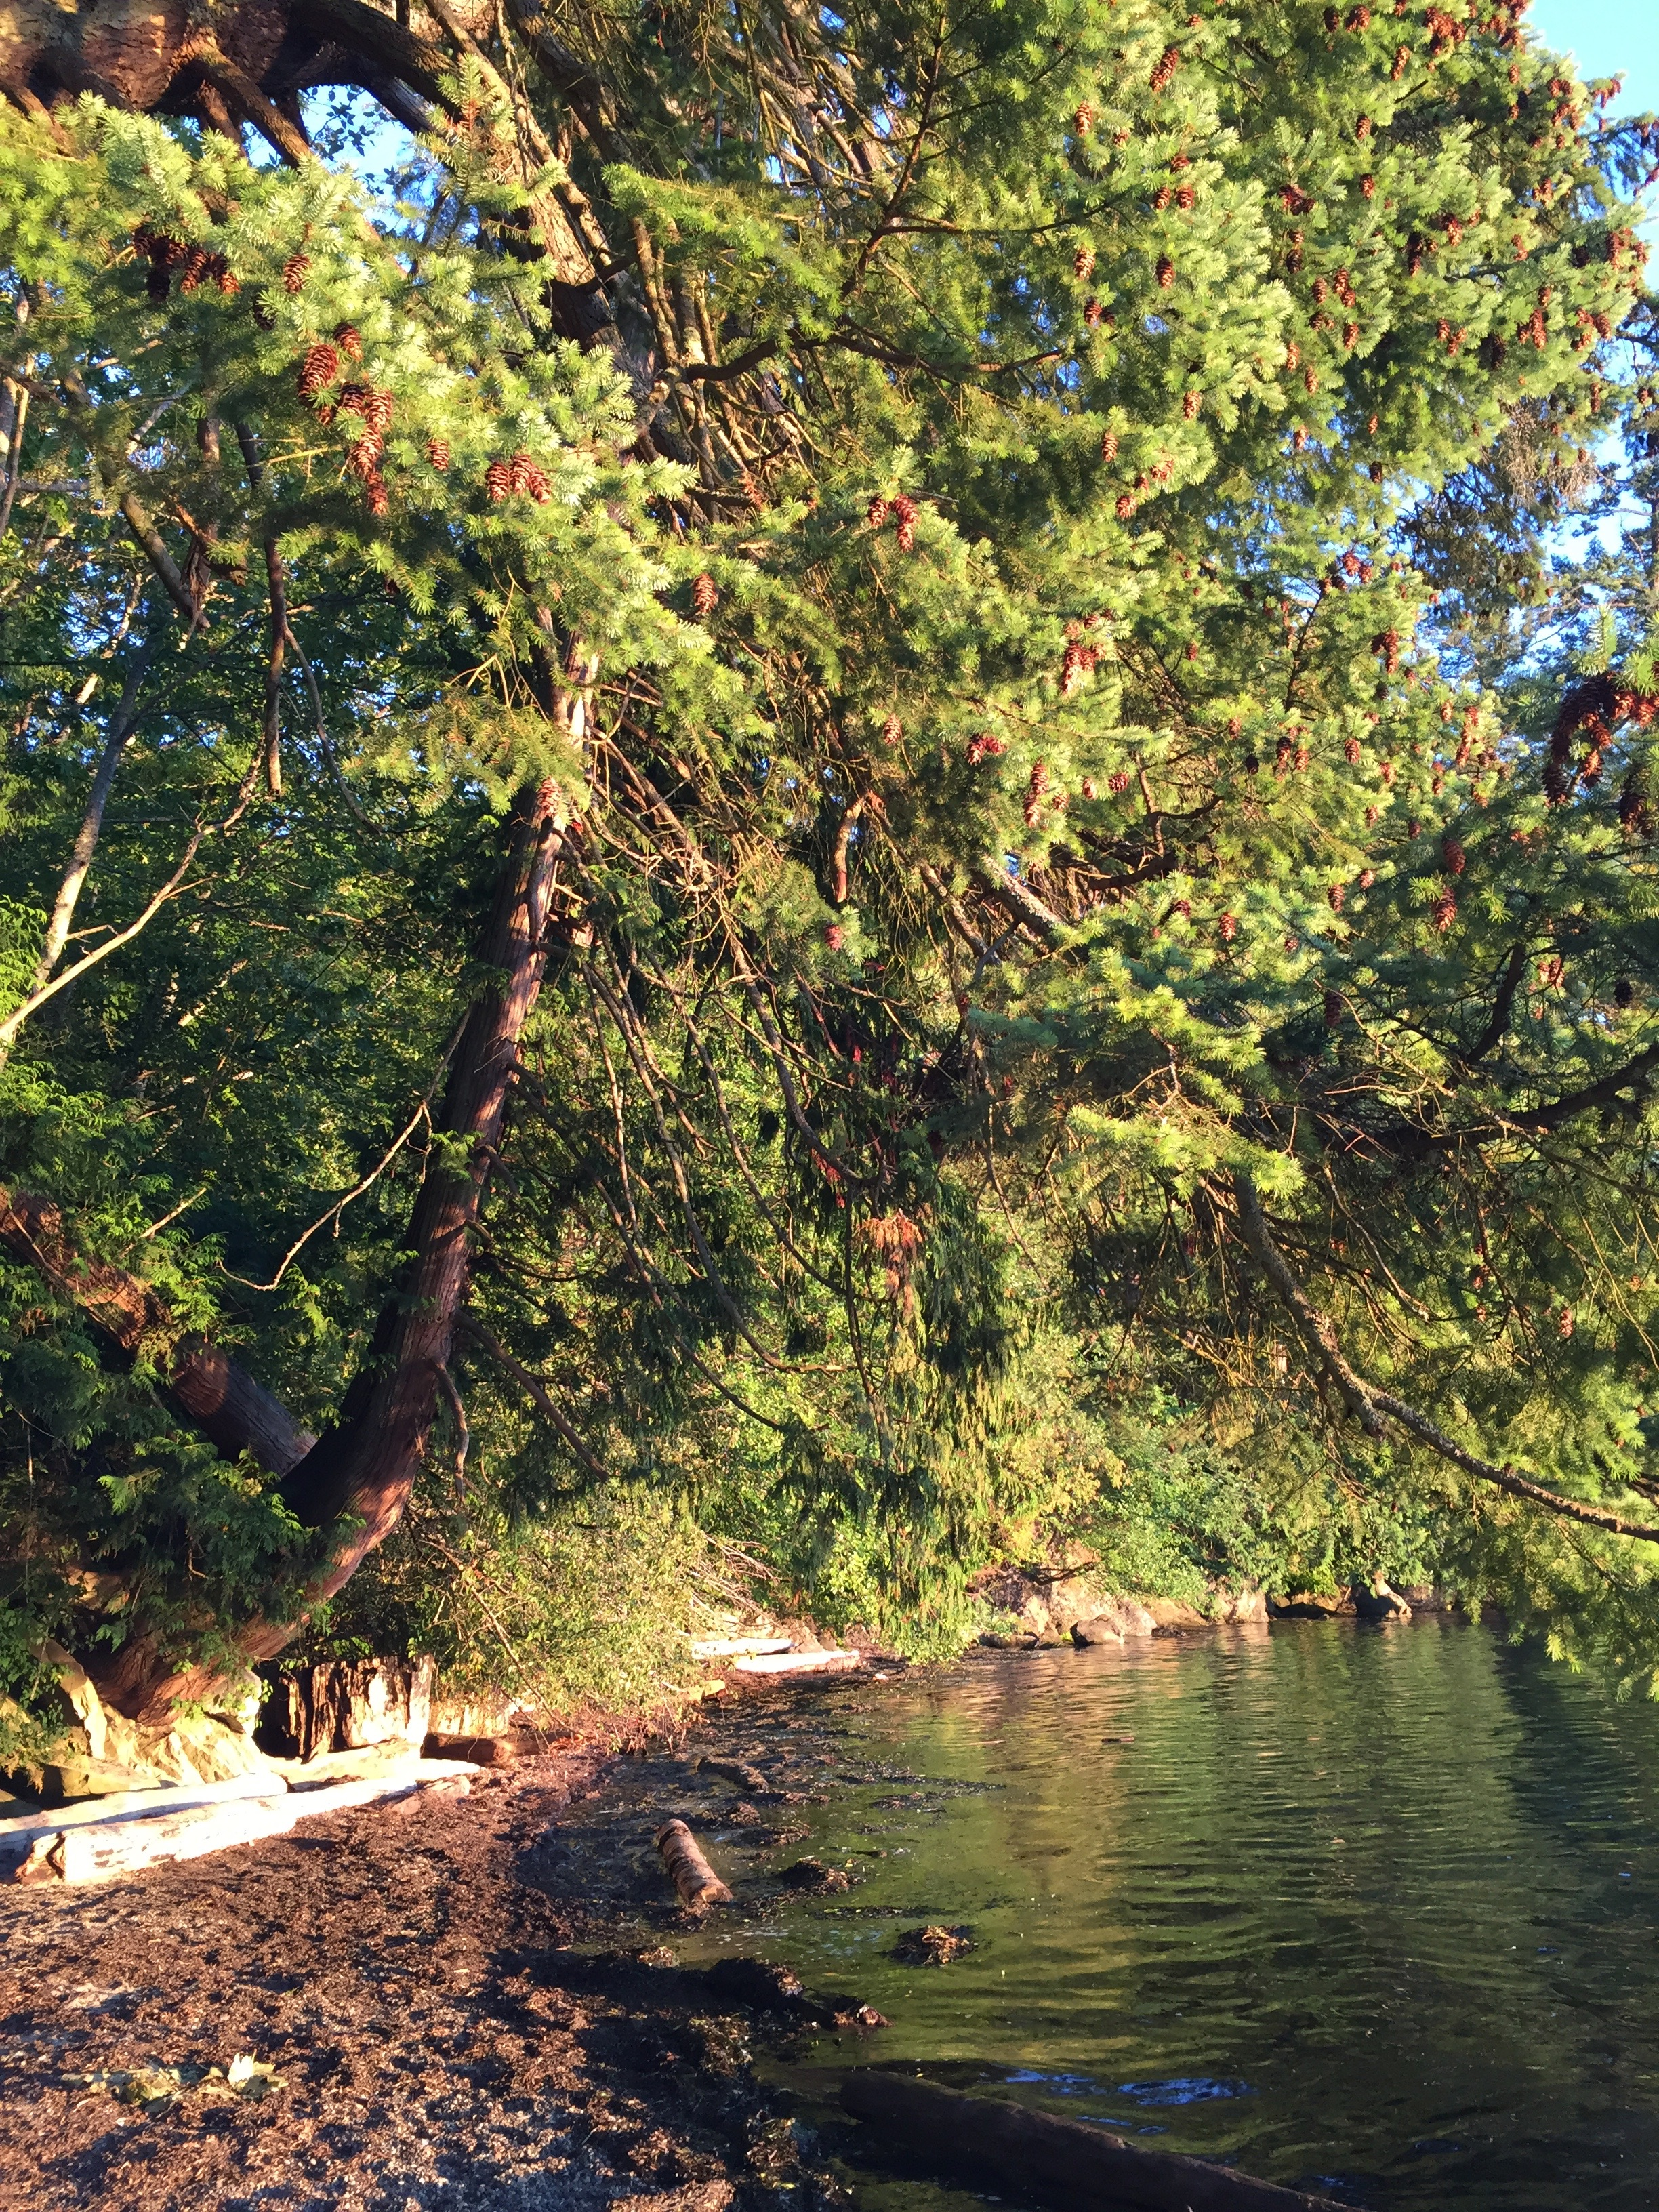 Wildcat Cove, Samish Bay, Larrabee State Park, Washington